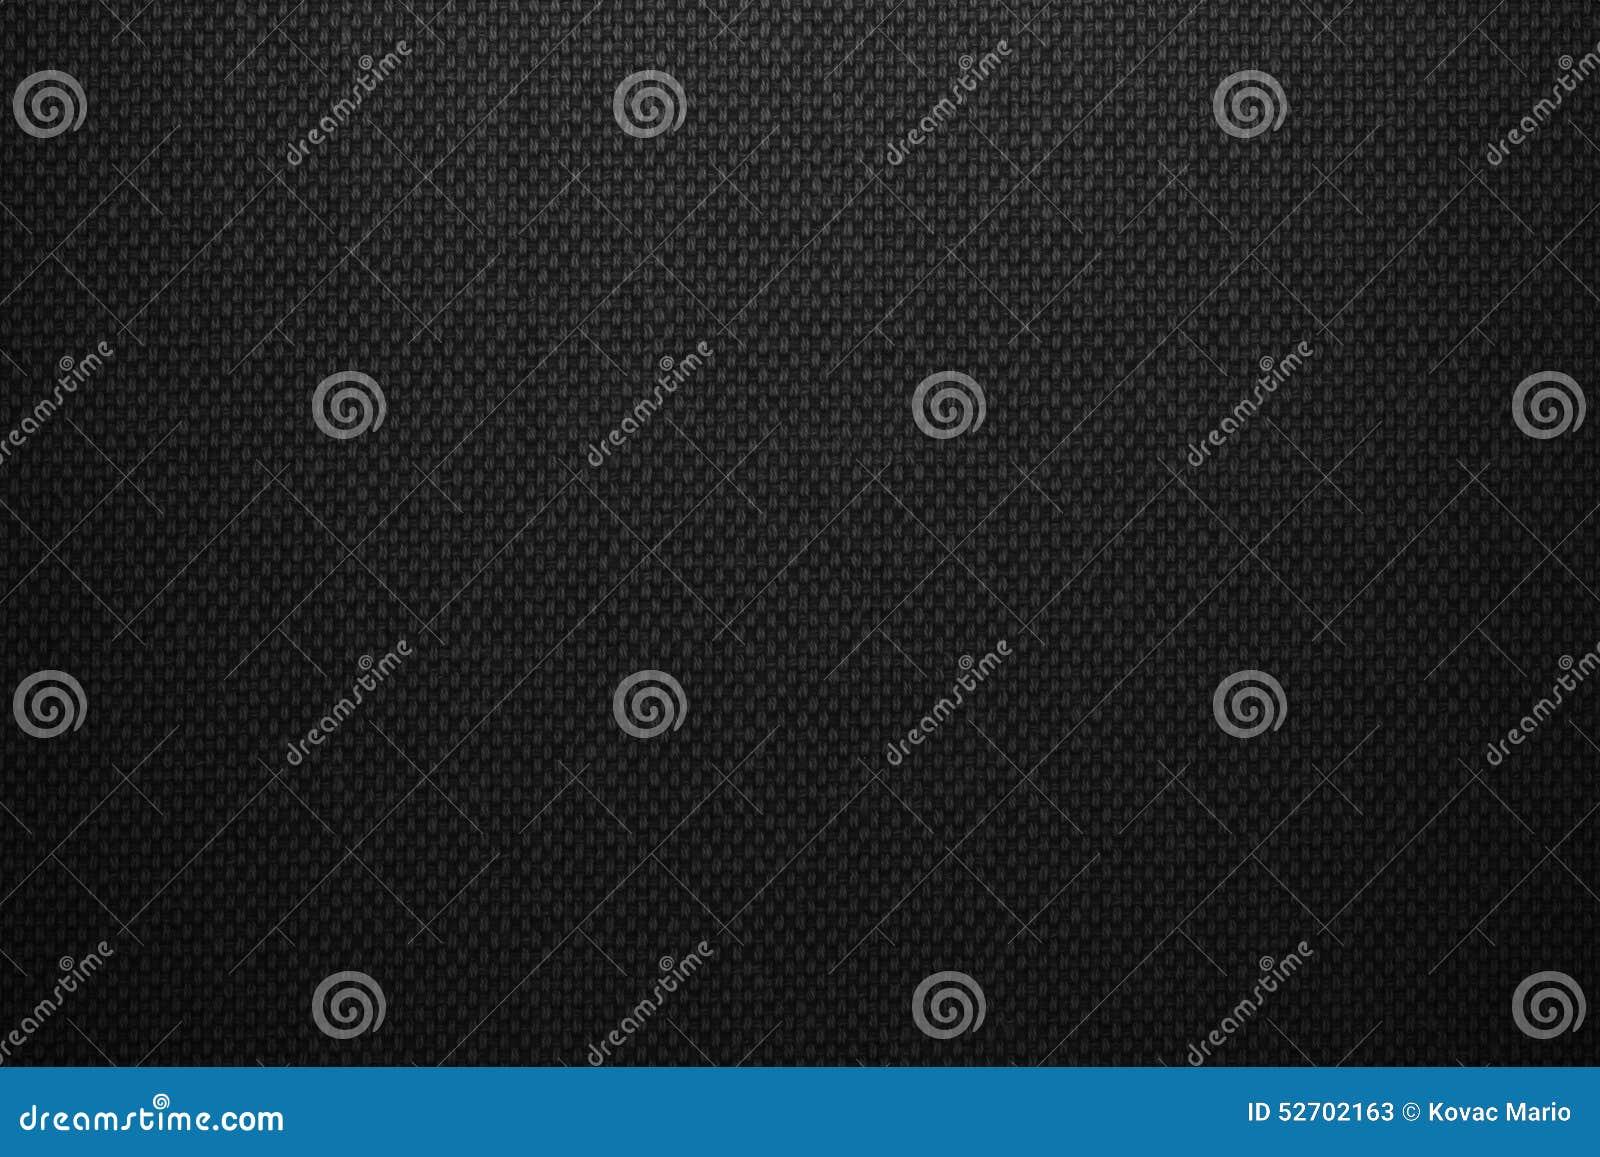 Black Canvas Background : Crumpled handmade gray fabric on a dark background